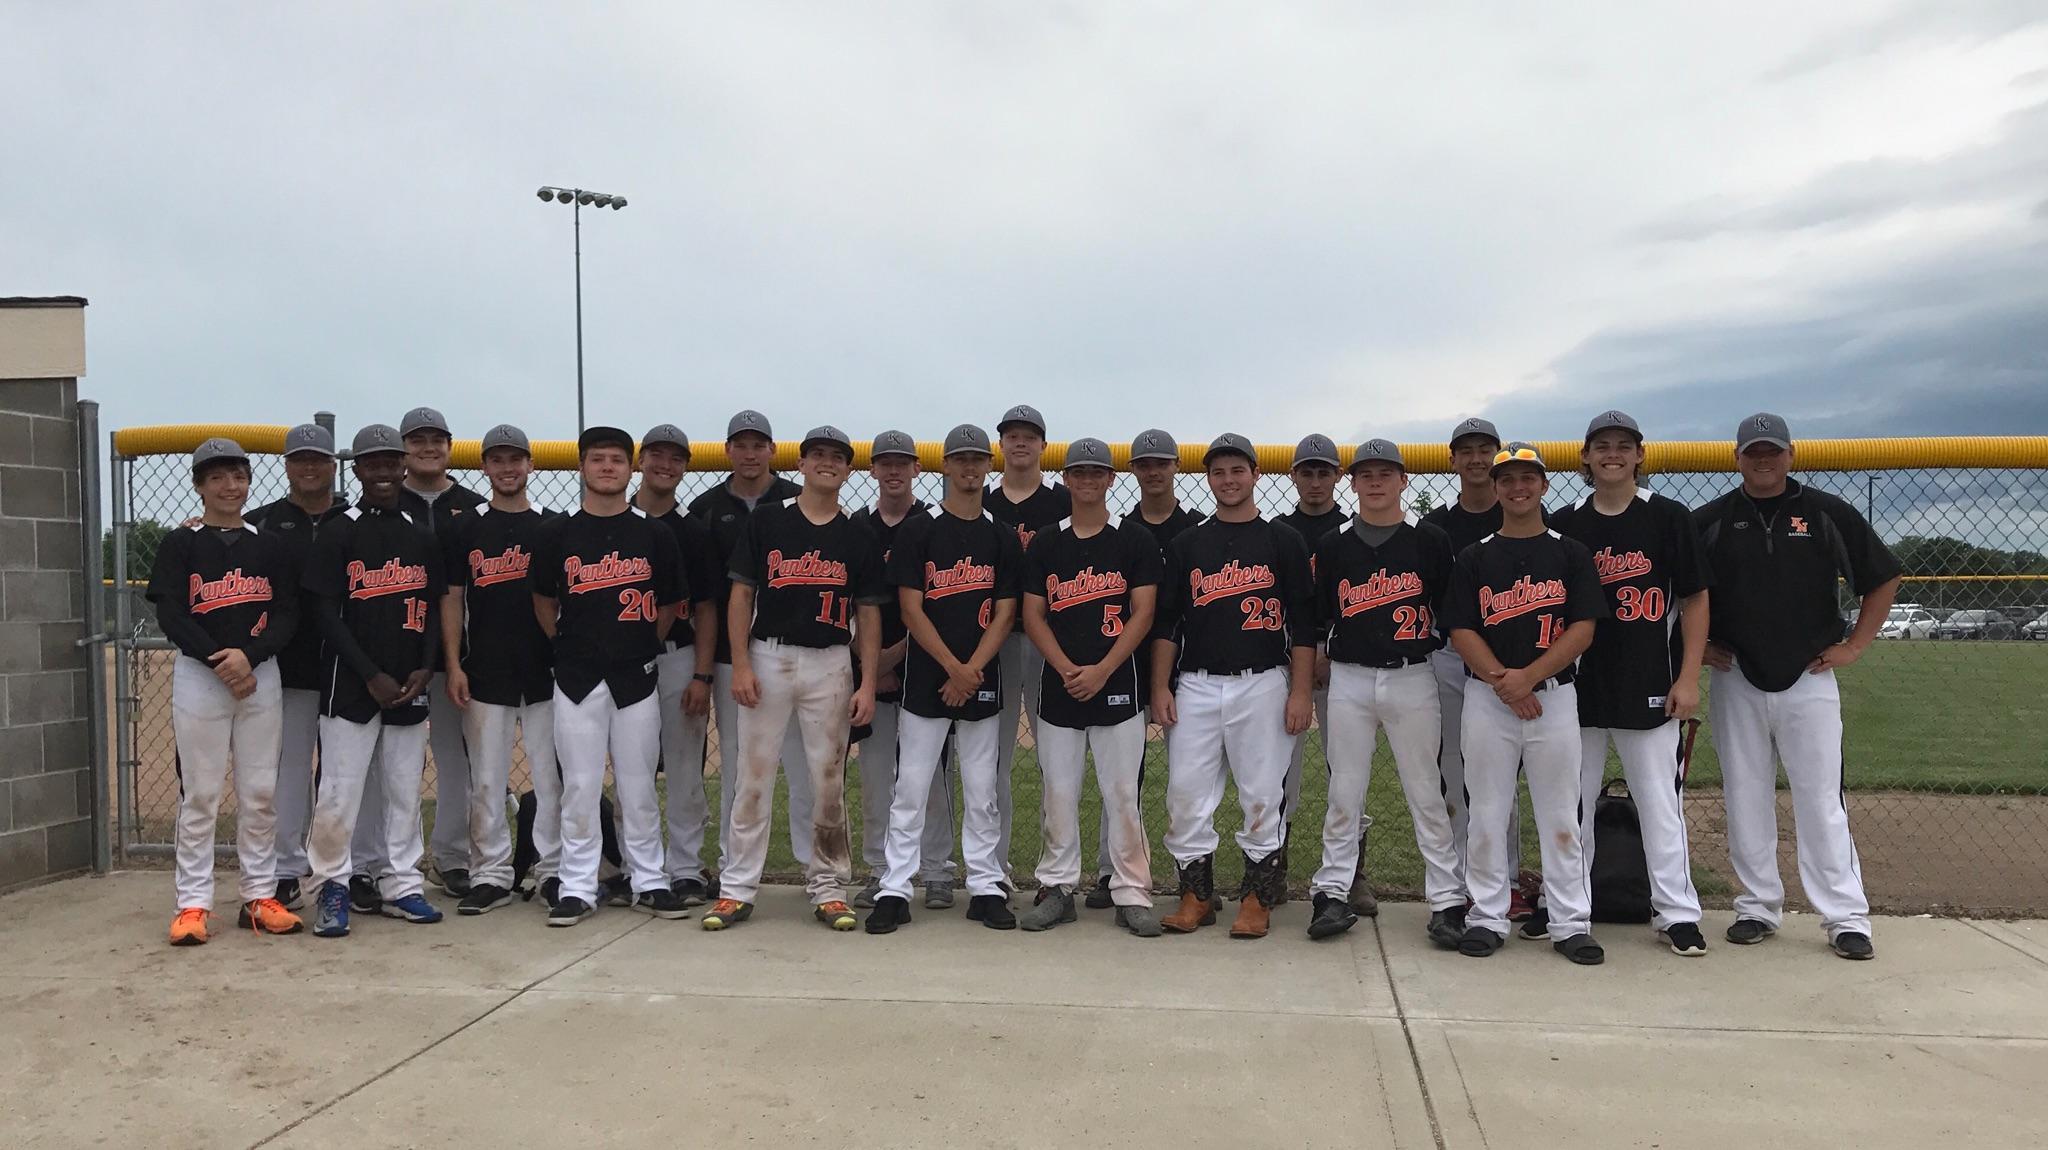 KNHS Baseball Team